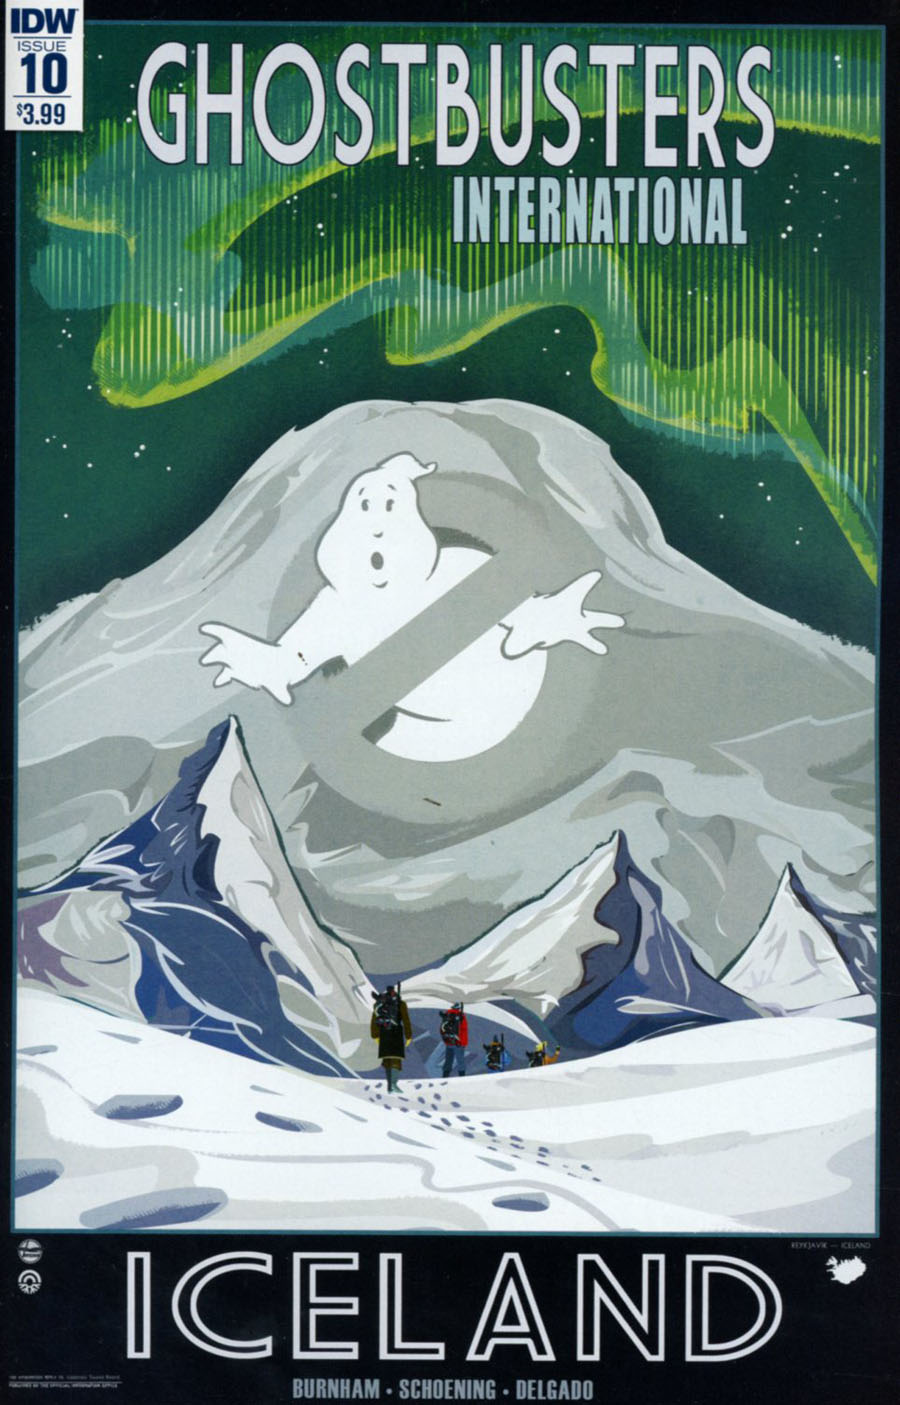 Ghostbusters International #10 Cover A Regular Dan Schoening Cover